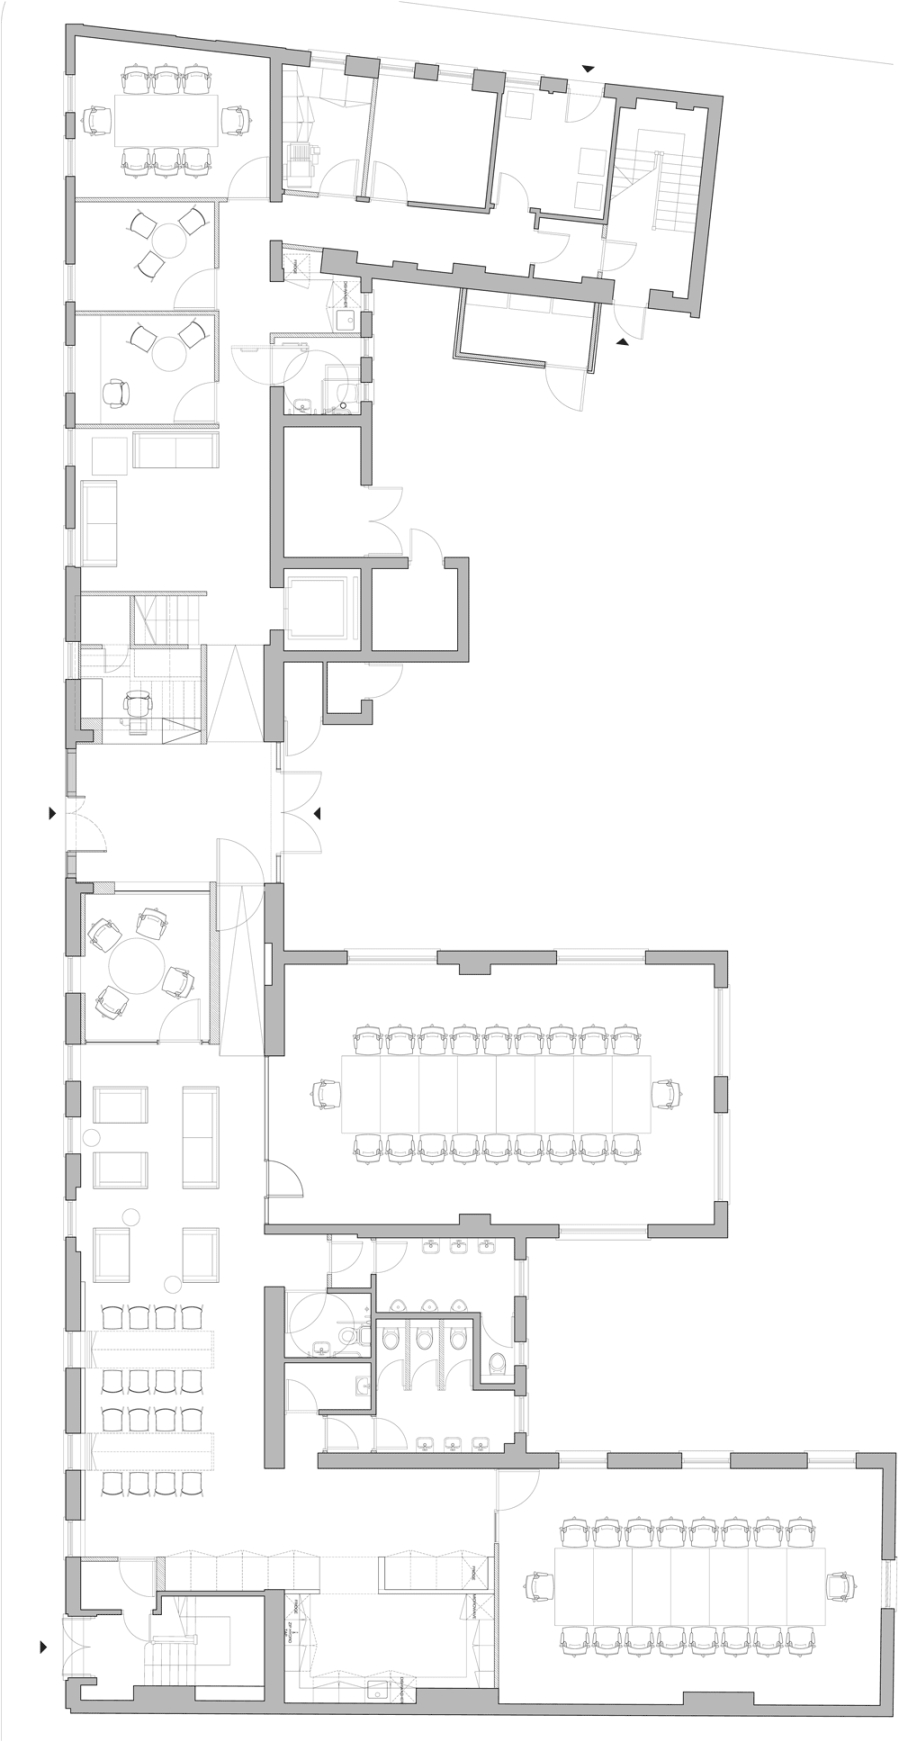 Floor plan of Arts Council England